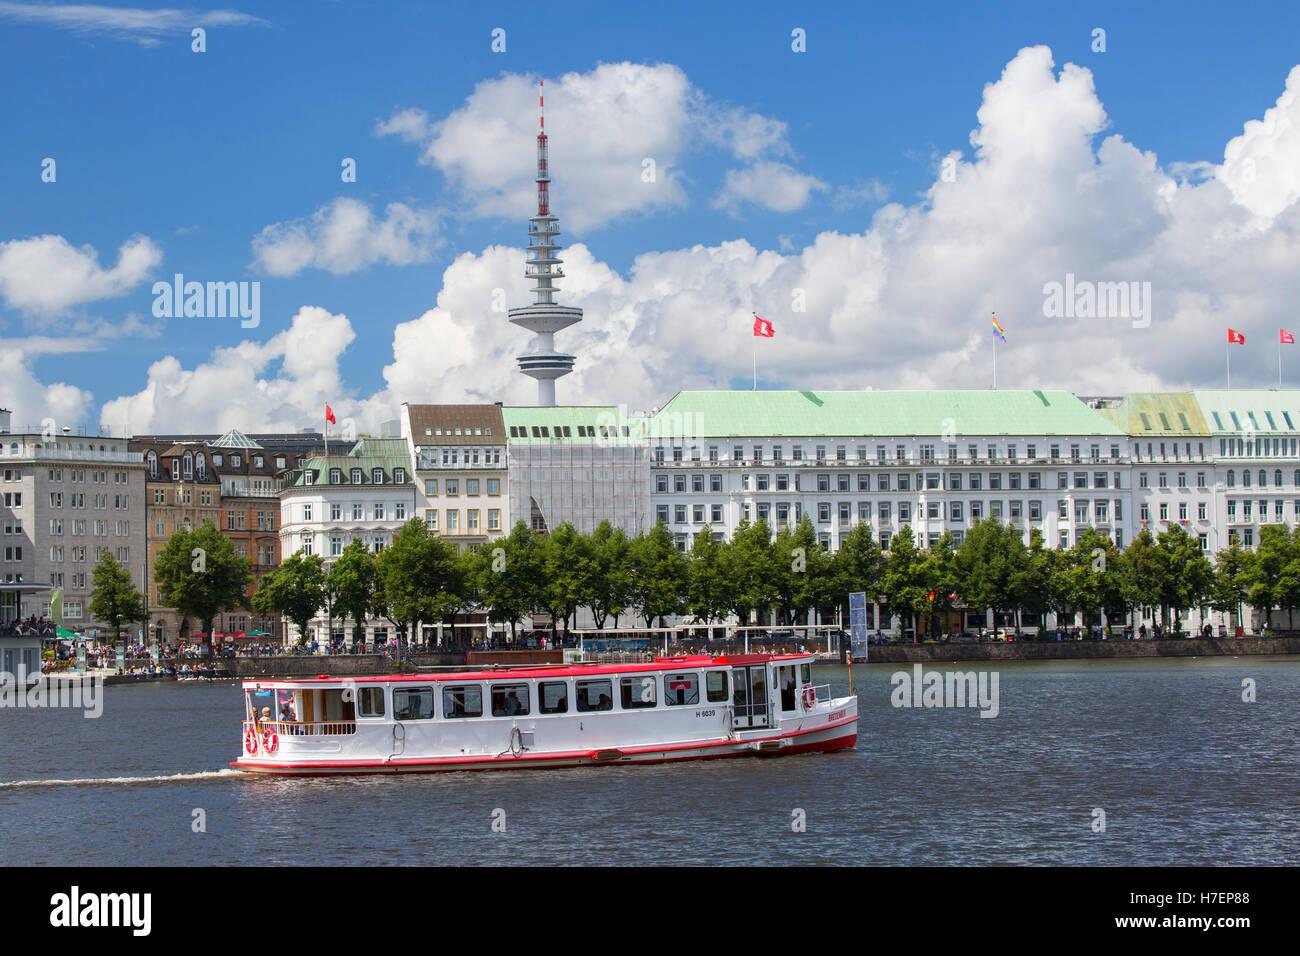 Cruise boat on Binnenalster Lake, Hamburg, Germany - Stock Image